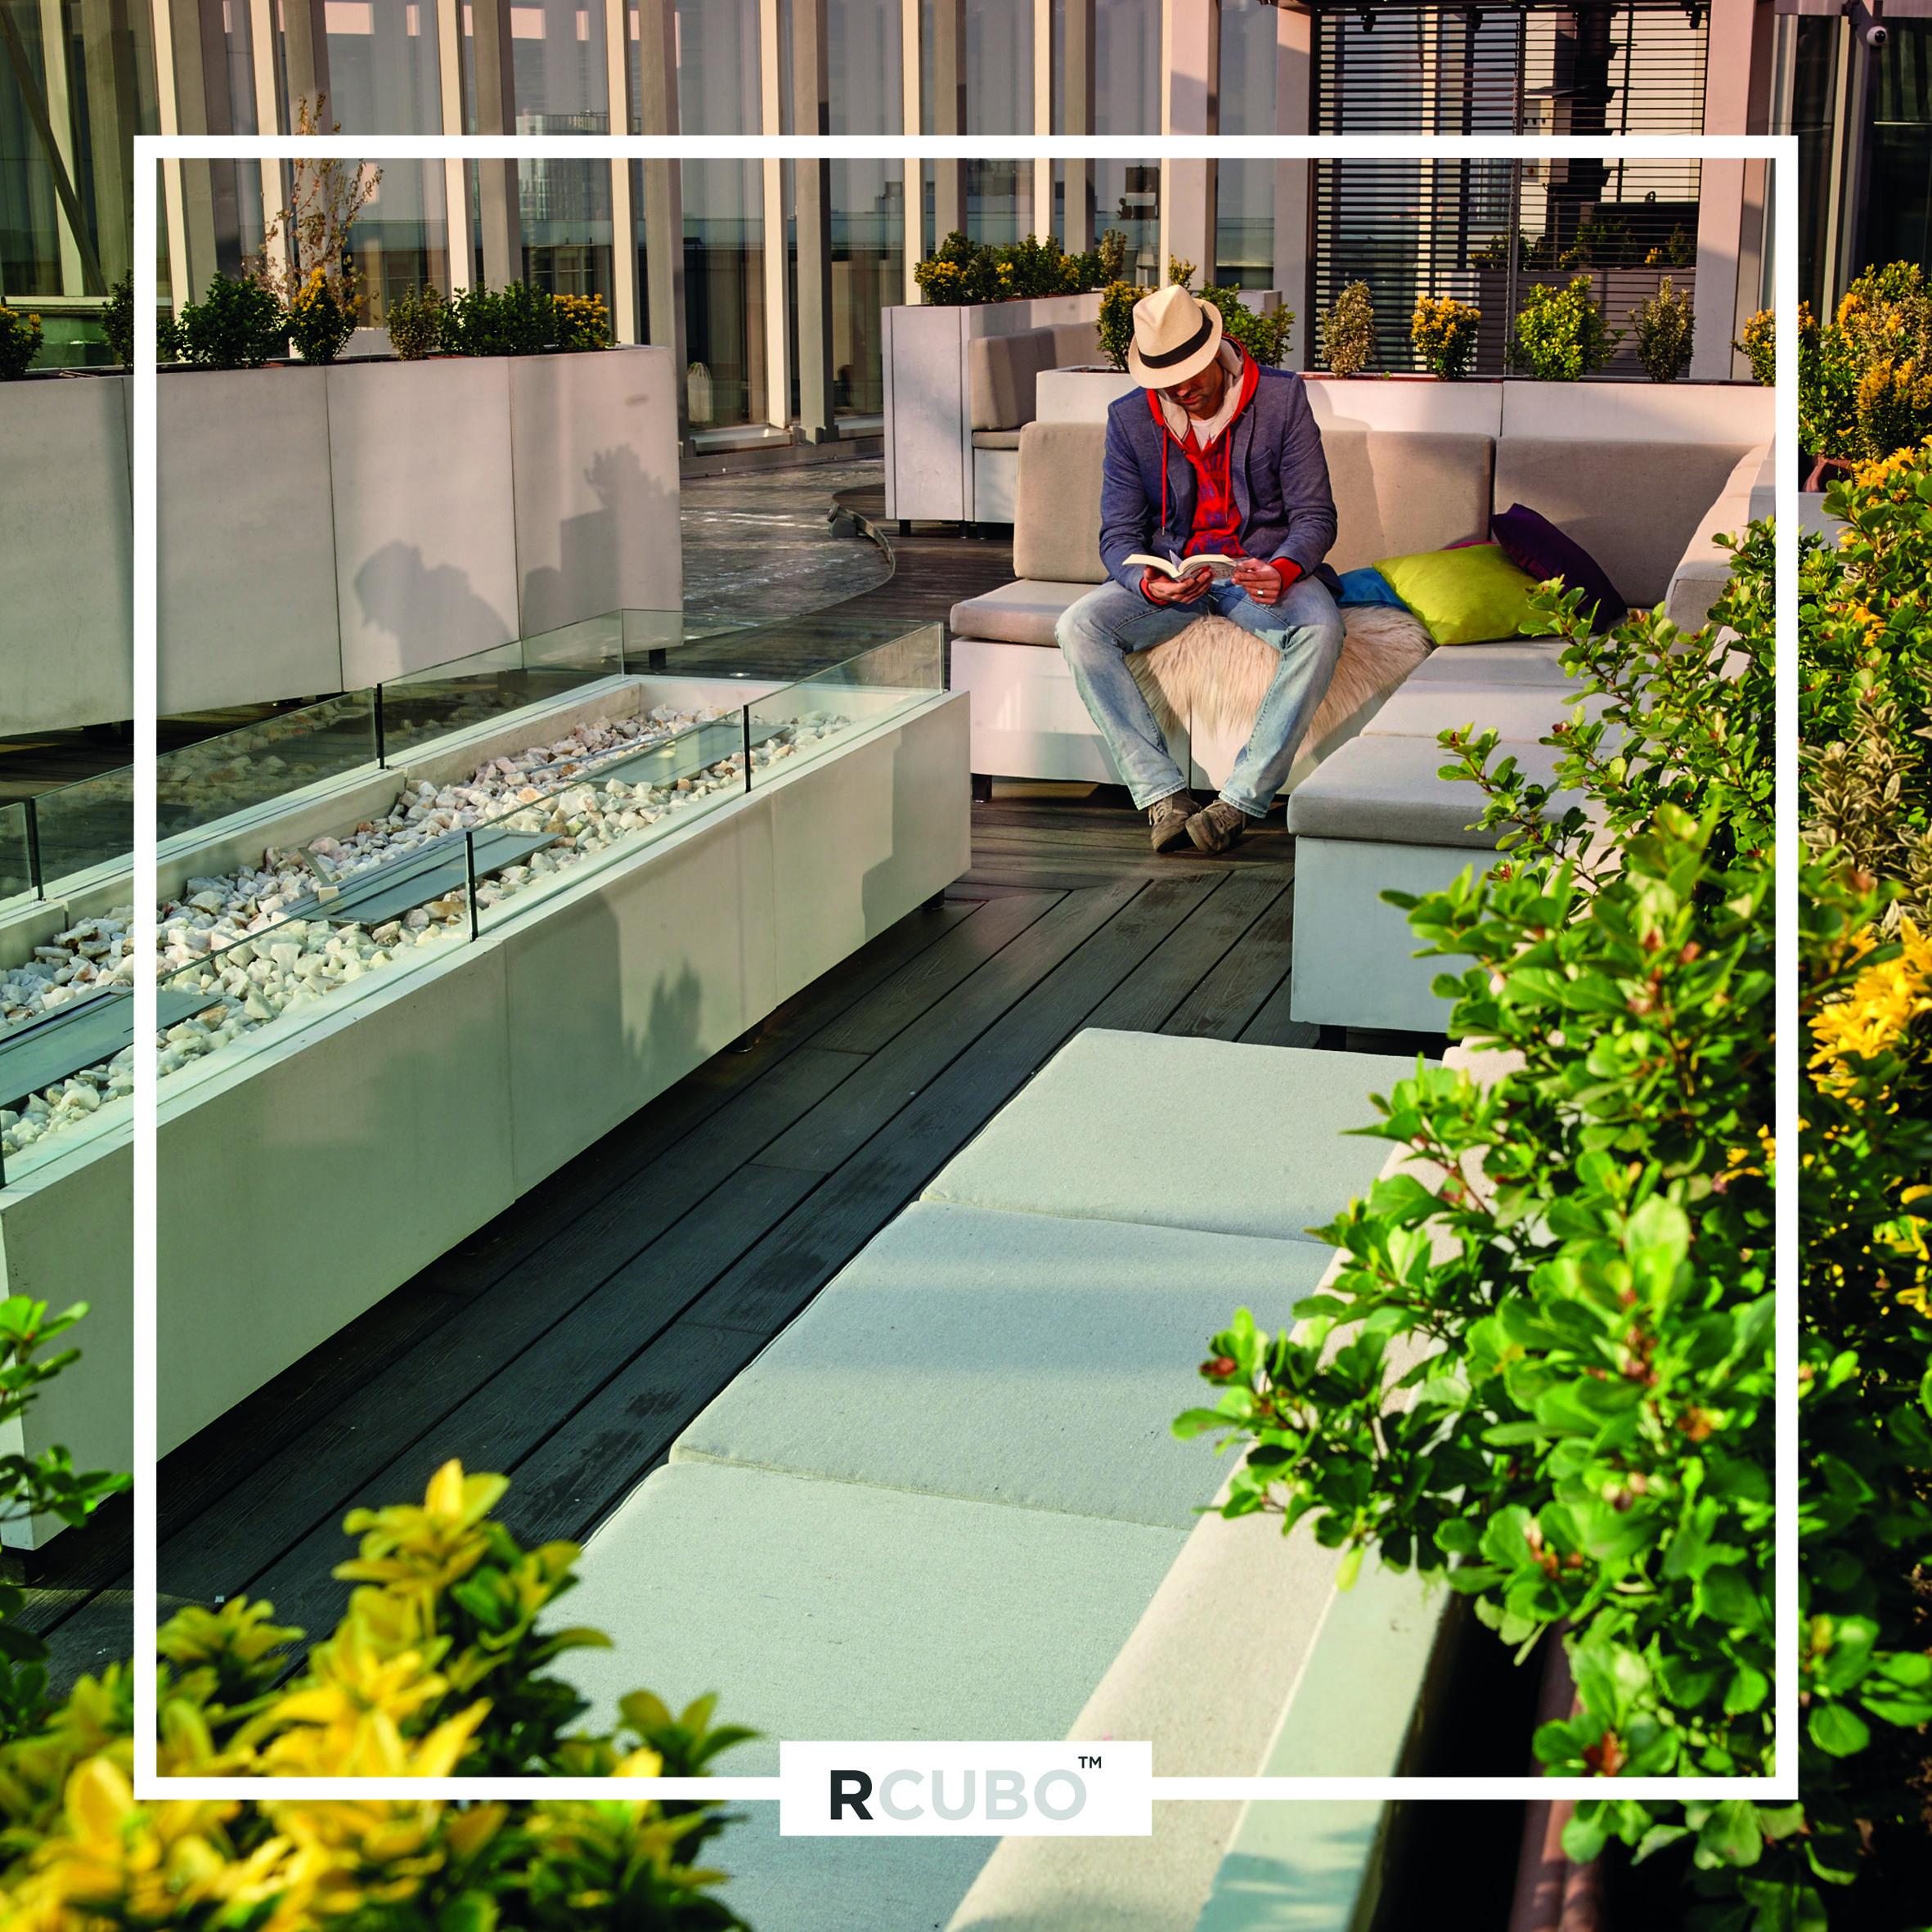 Conjunto Modular De Terraza Exterior En Cemento Gran Tico Rcubo  ~ Jardineras De Obra Para Terraza